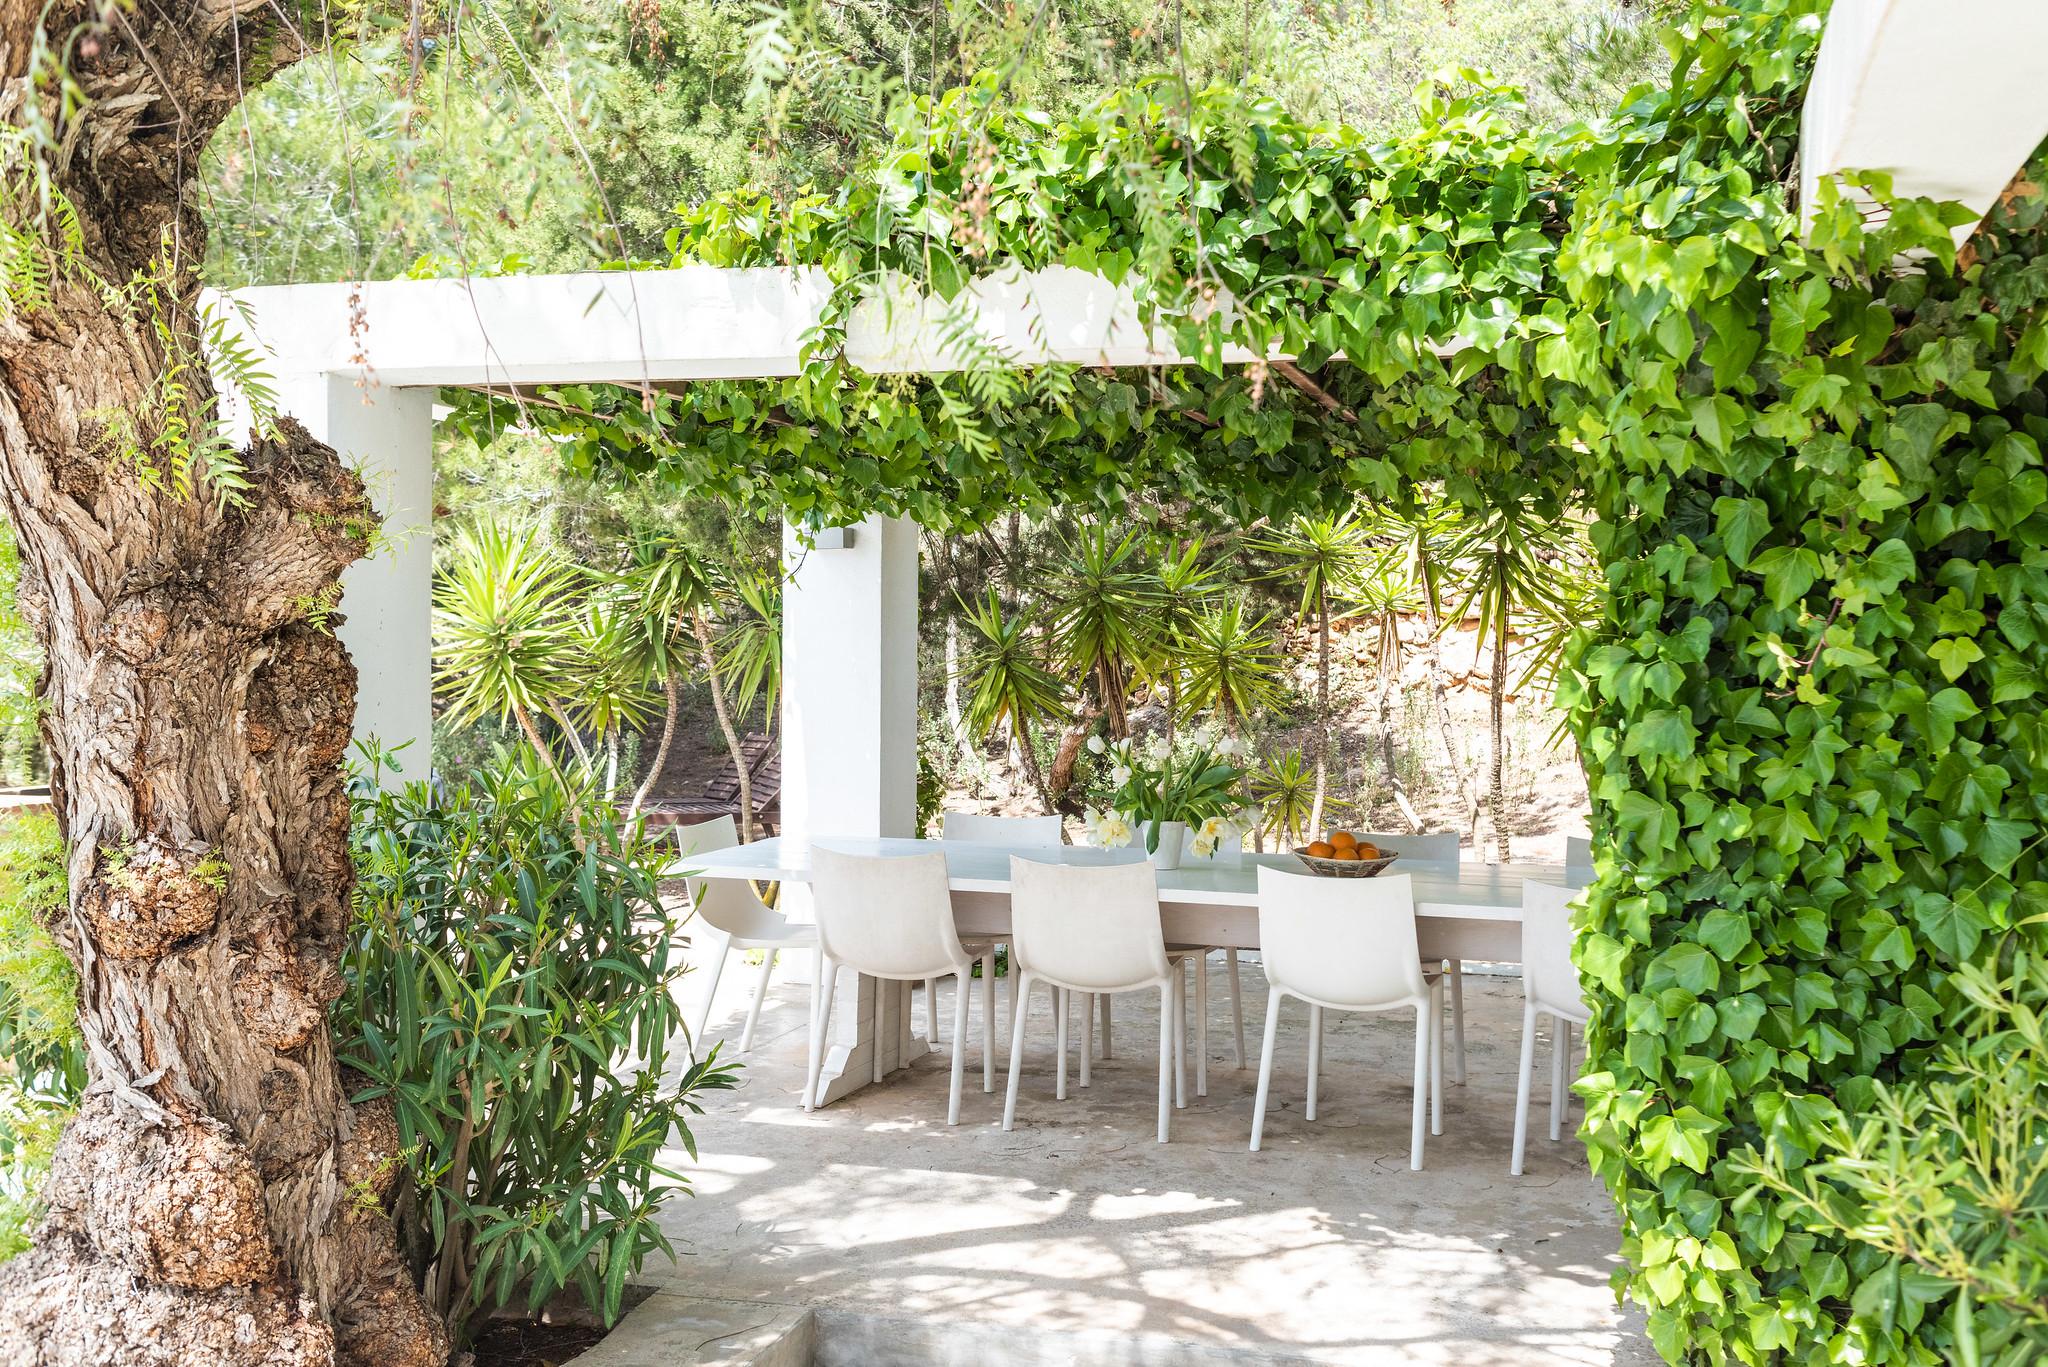 https://www.white-ibiza.com/wp-content/uploads/2020/06/white-ibiza-villas-villa-azul-exterior-dining2.jpg